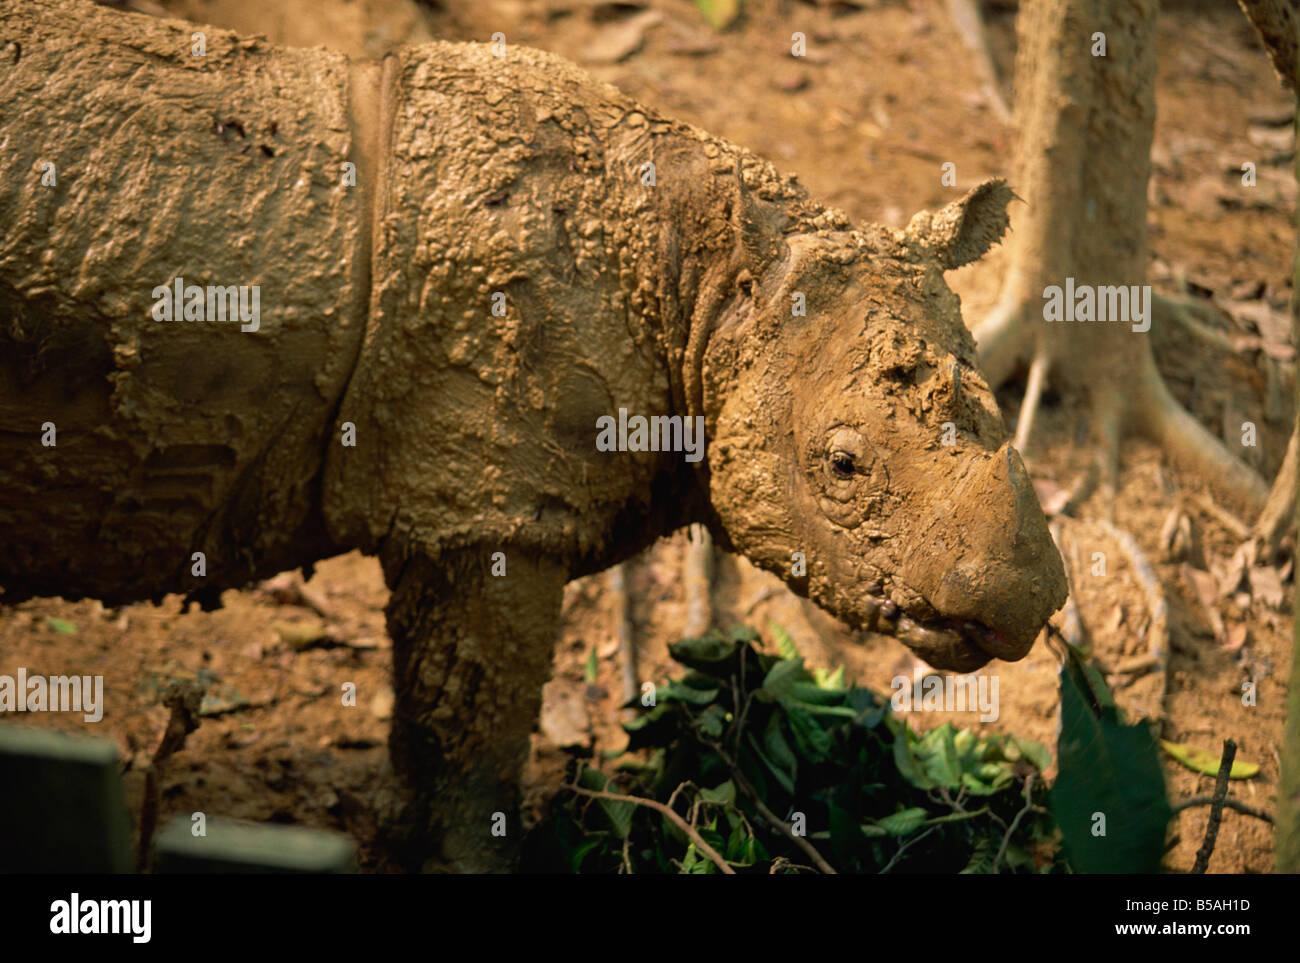 Les rares rhinocéros velu, le plus petit type de rhino au Sanctuaire Sepilok Orang-Utan, près de Sandakan, Photo Stock